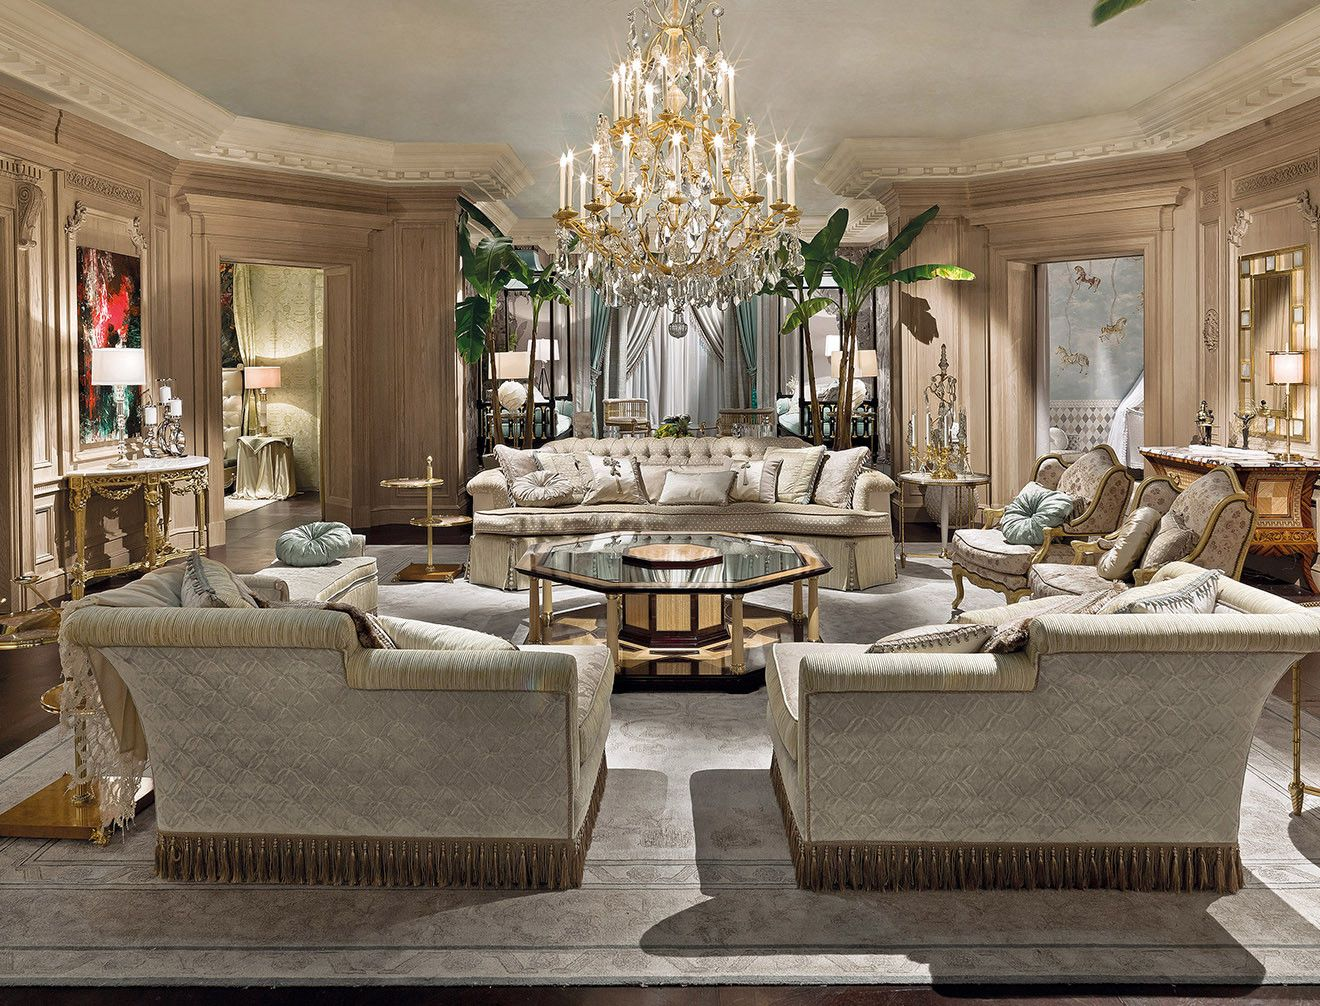 Luxury Italian Living Room Interior Design By Provasi With Elegant Chandelier